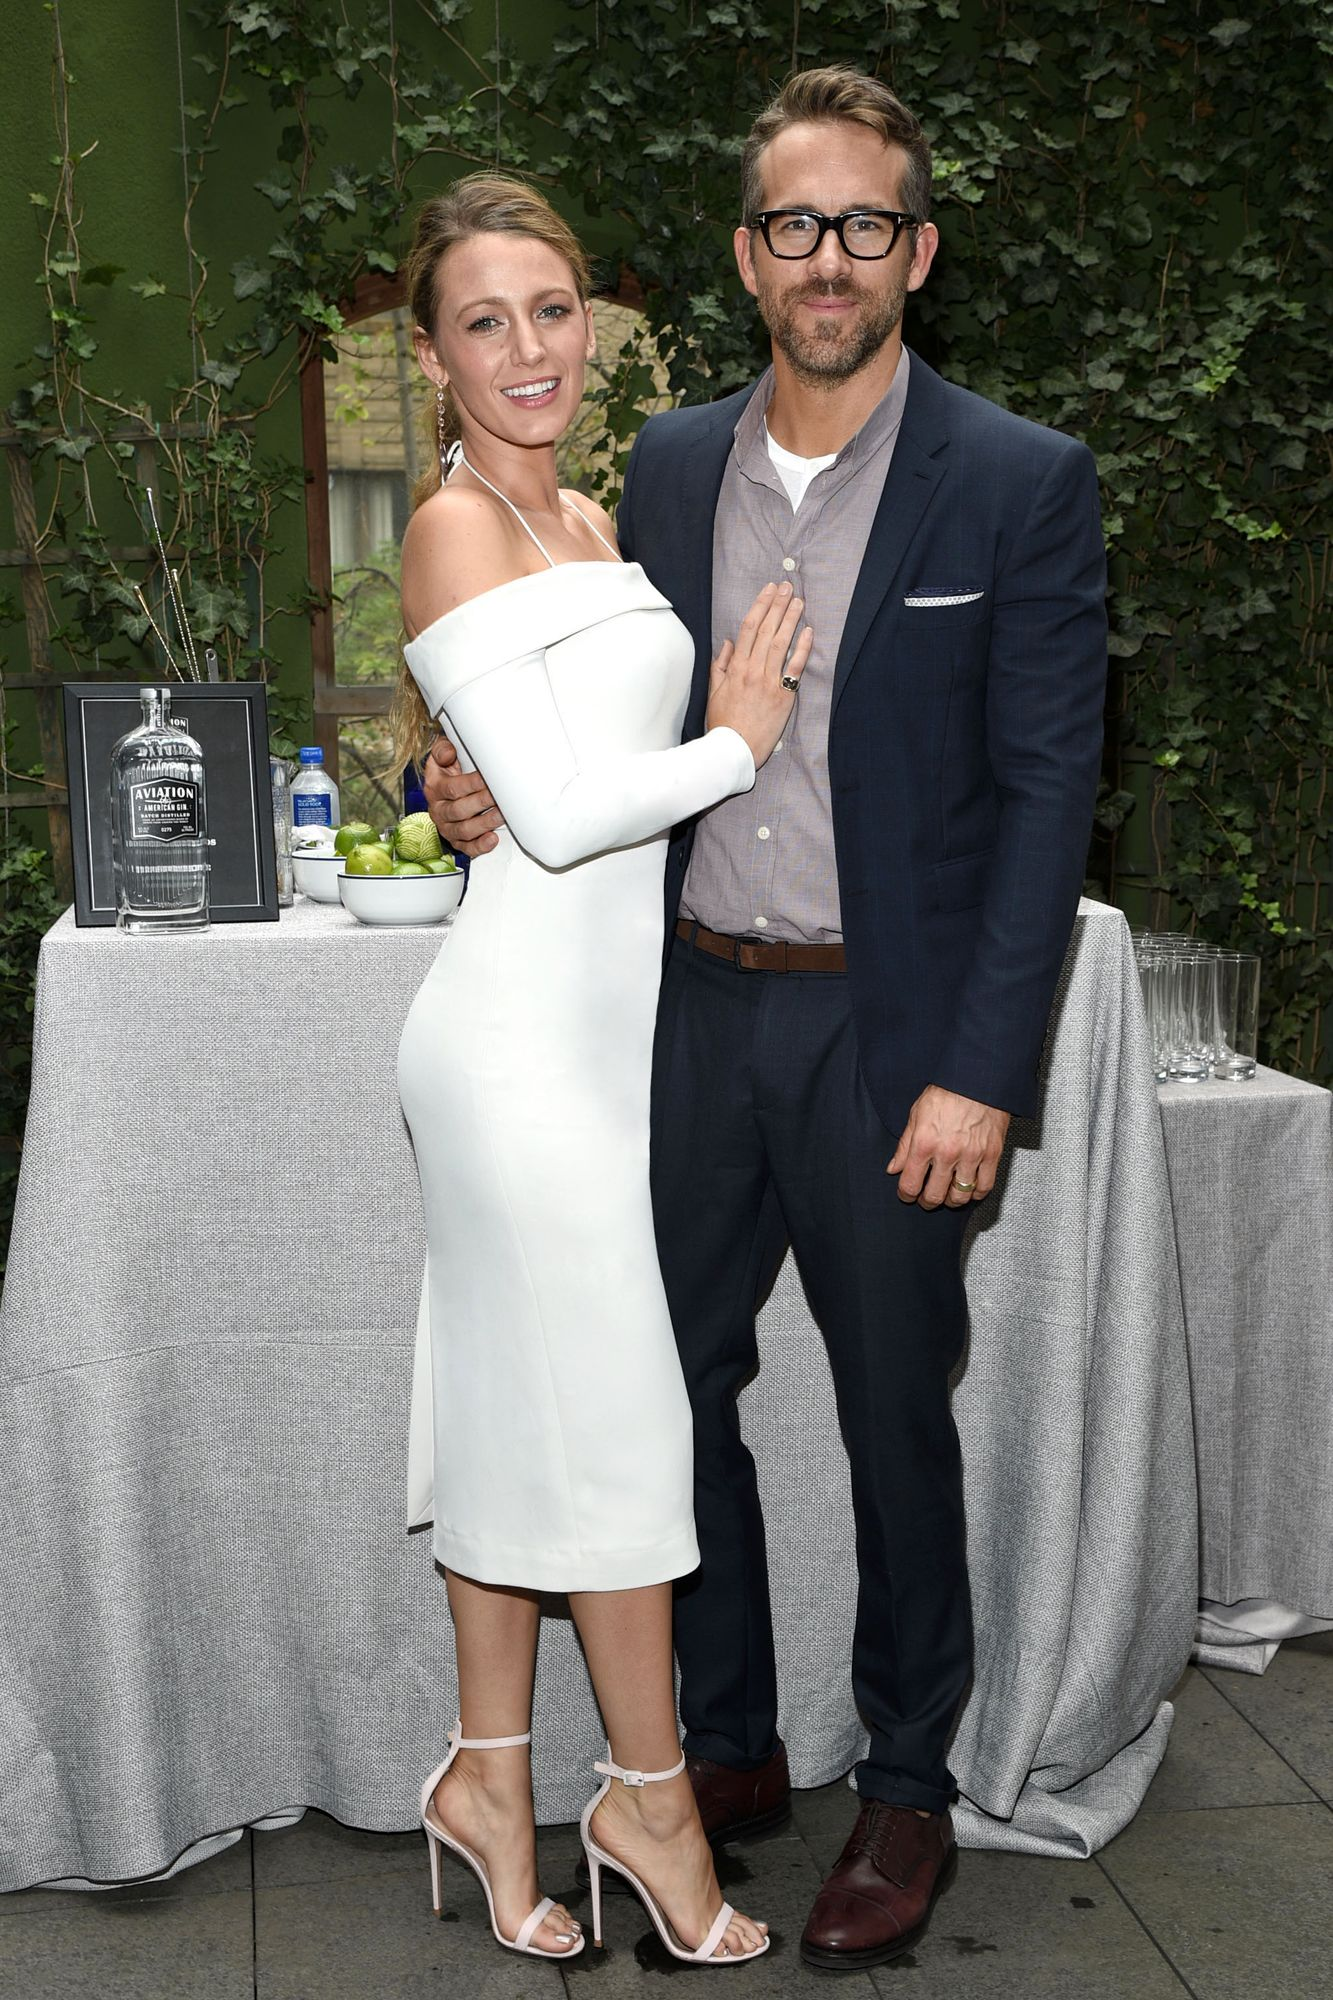 Blake Lively Attends Ryan Reynolds' N.Y.C. Work Event